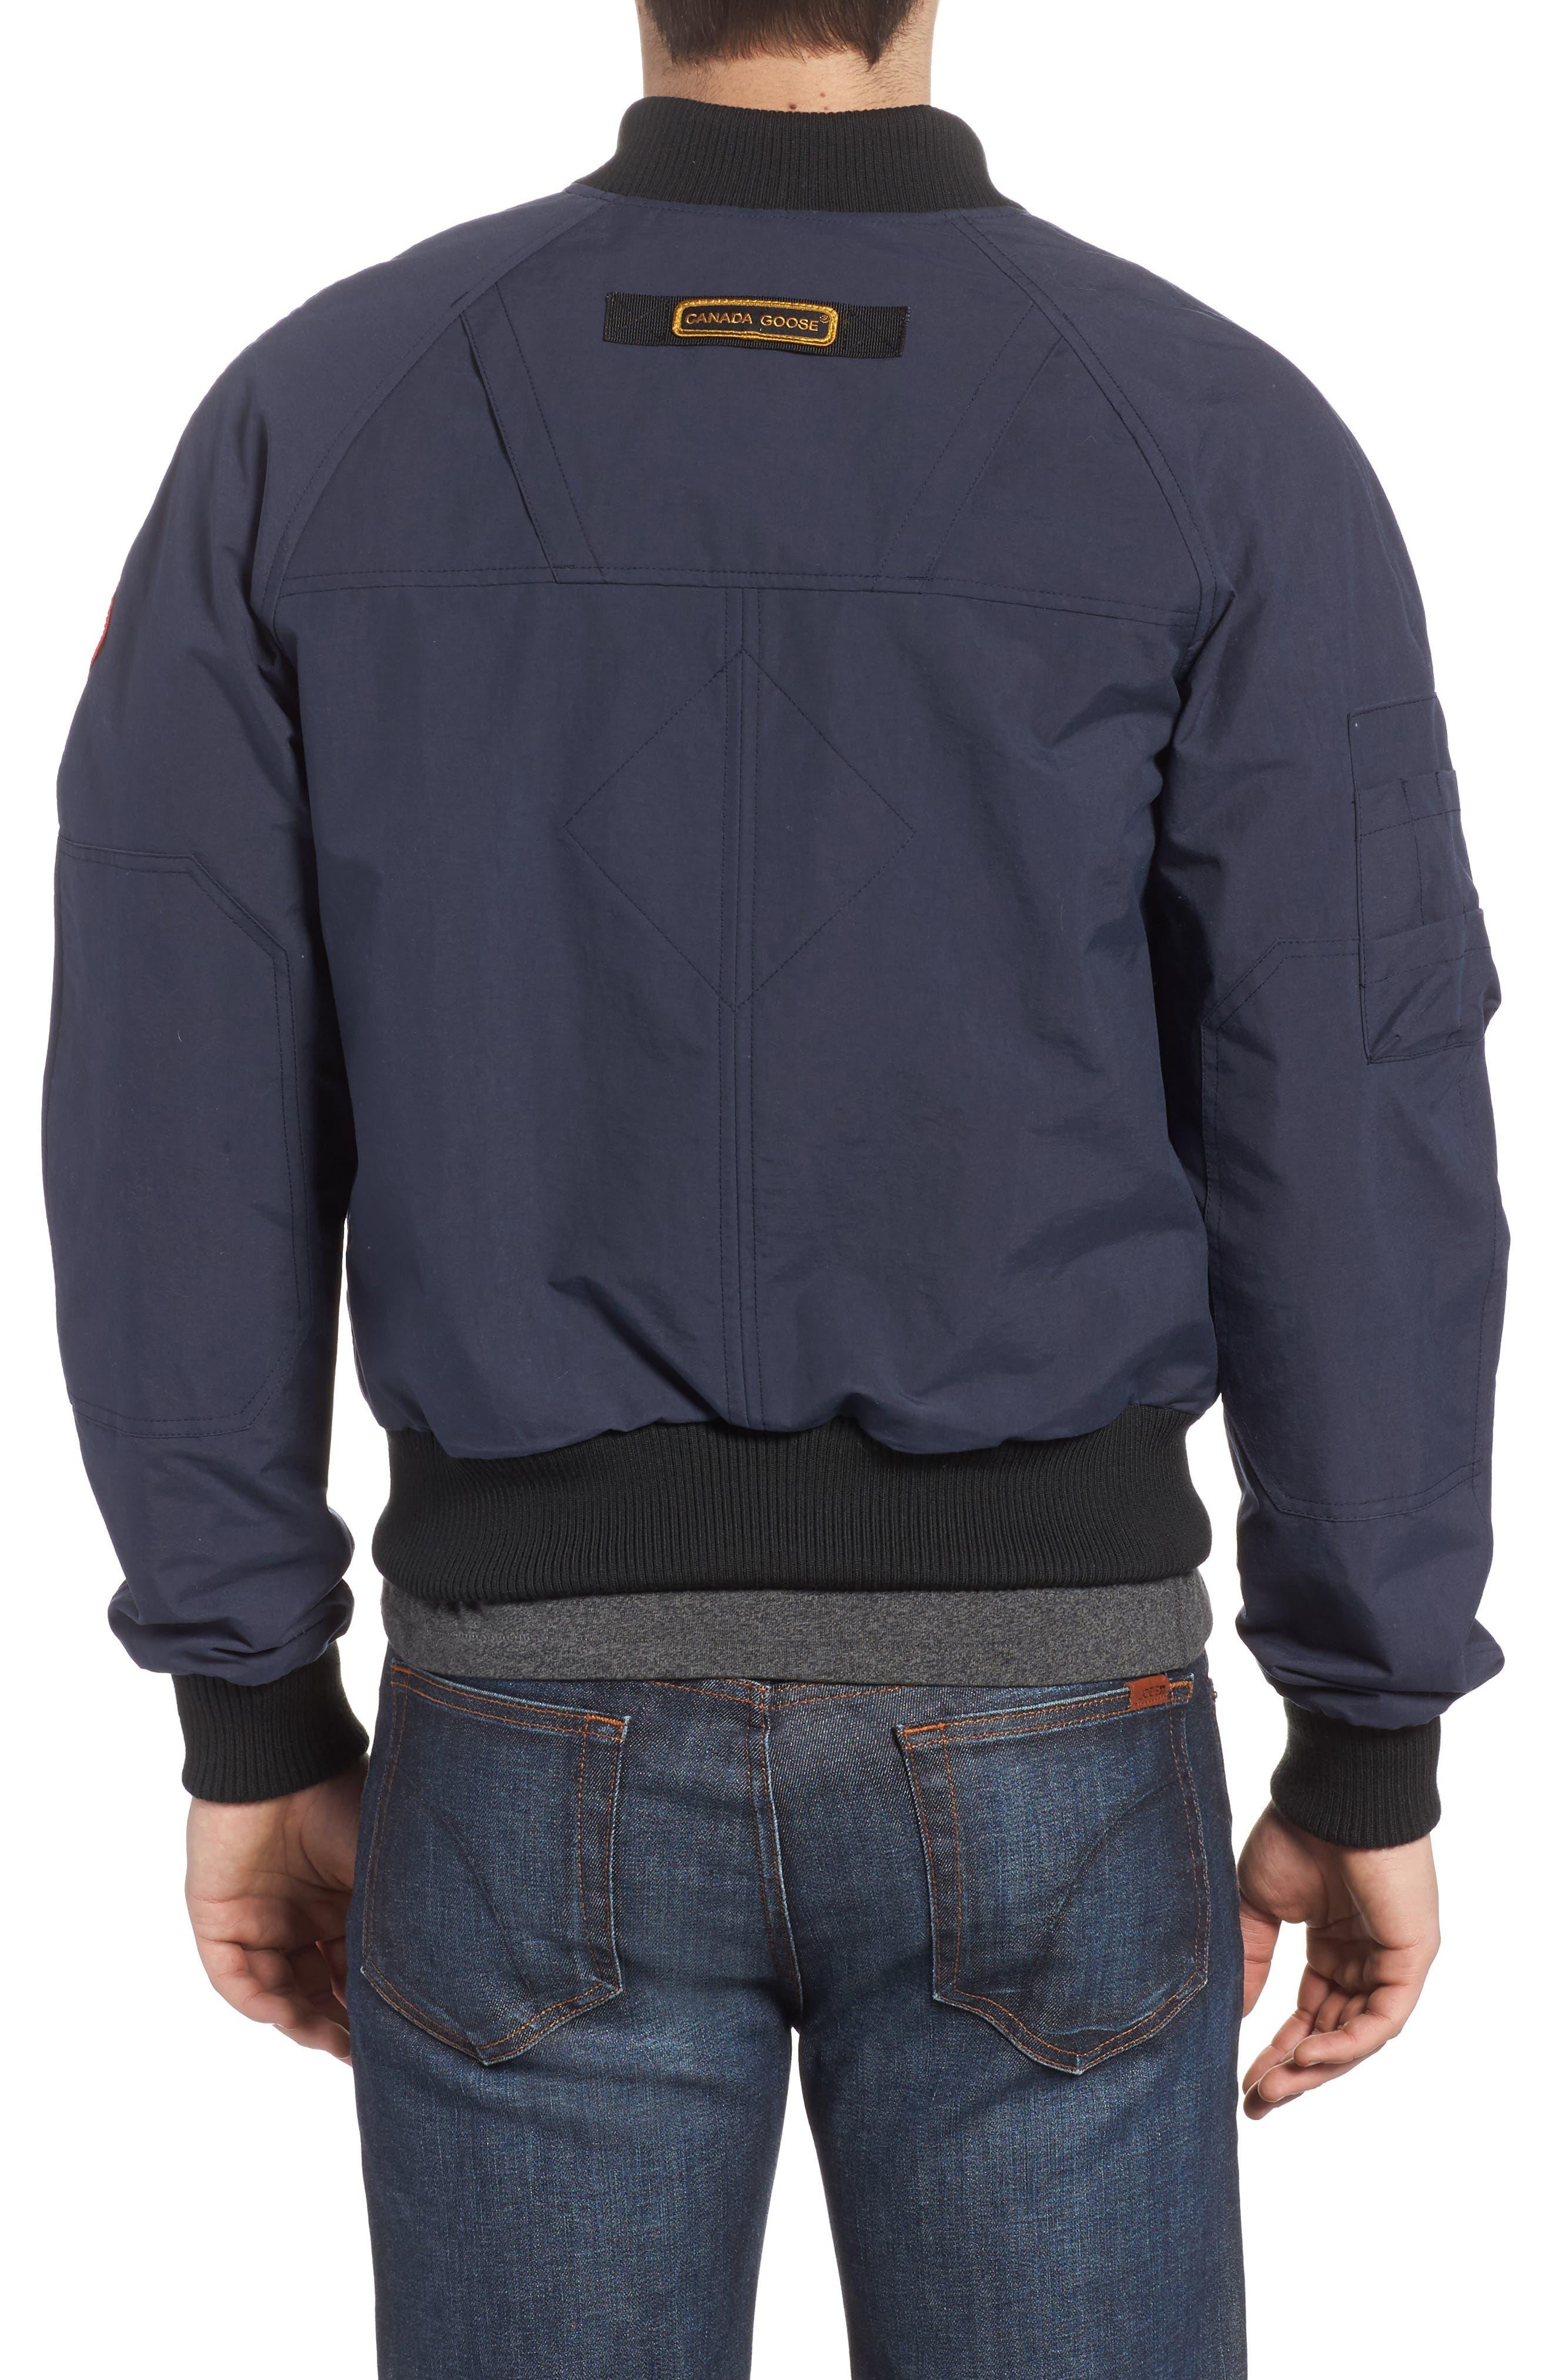 CANADA GOOSE, Faber Slim Fit Bomber Jacket, Alternate thumbnail 2, color, 400